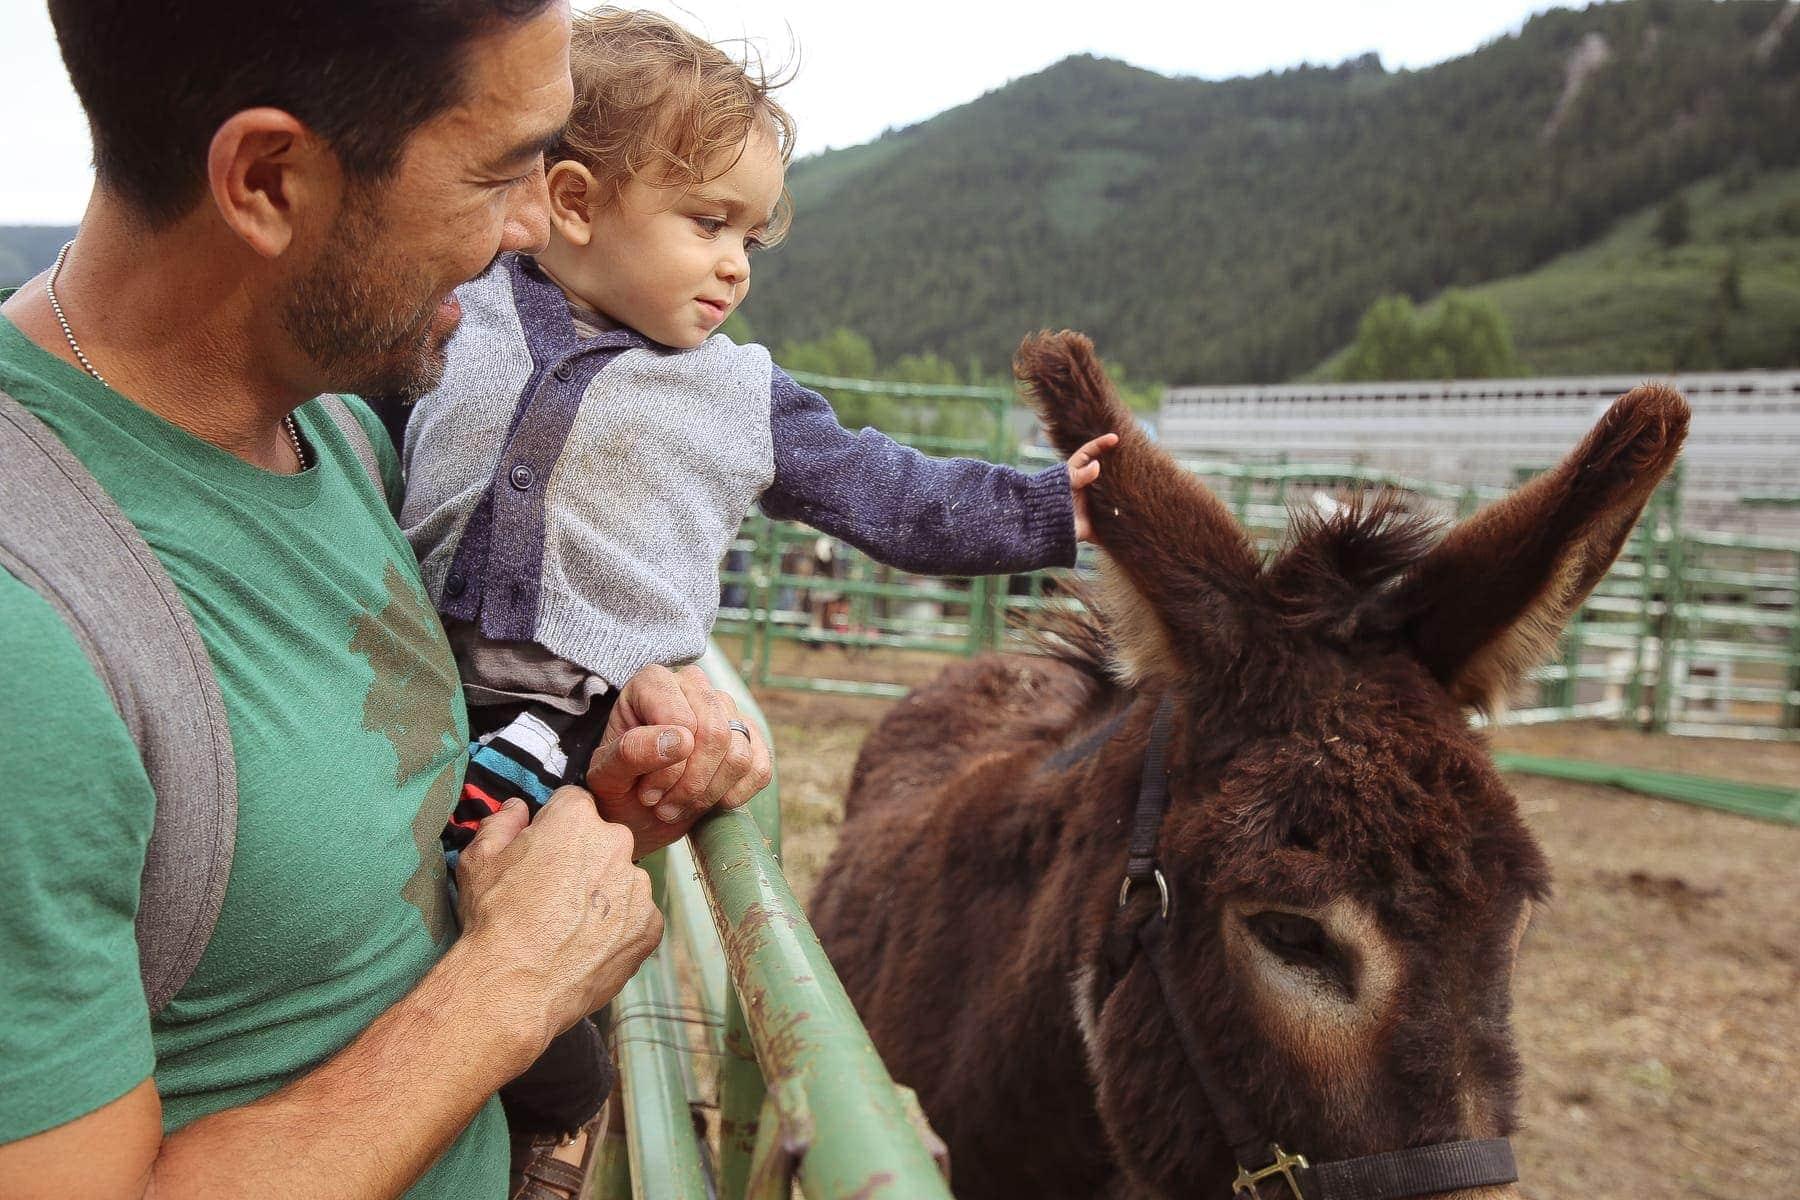 baby petting donkey